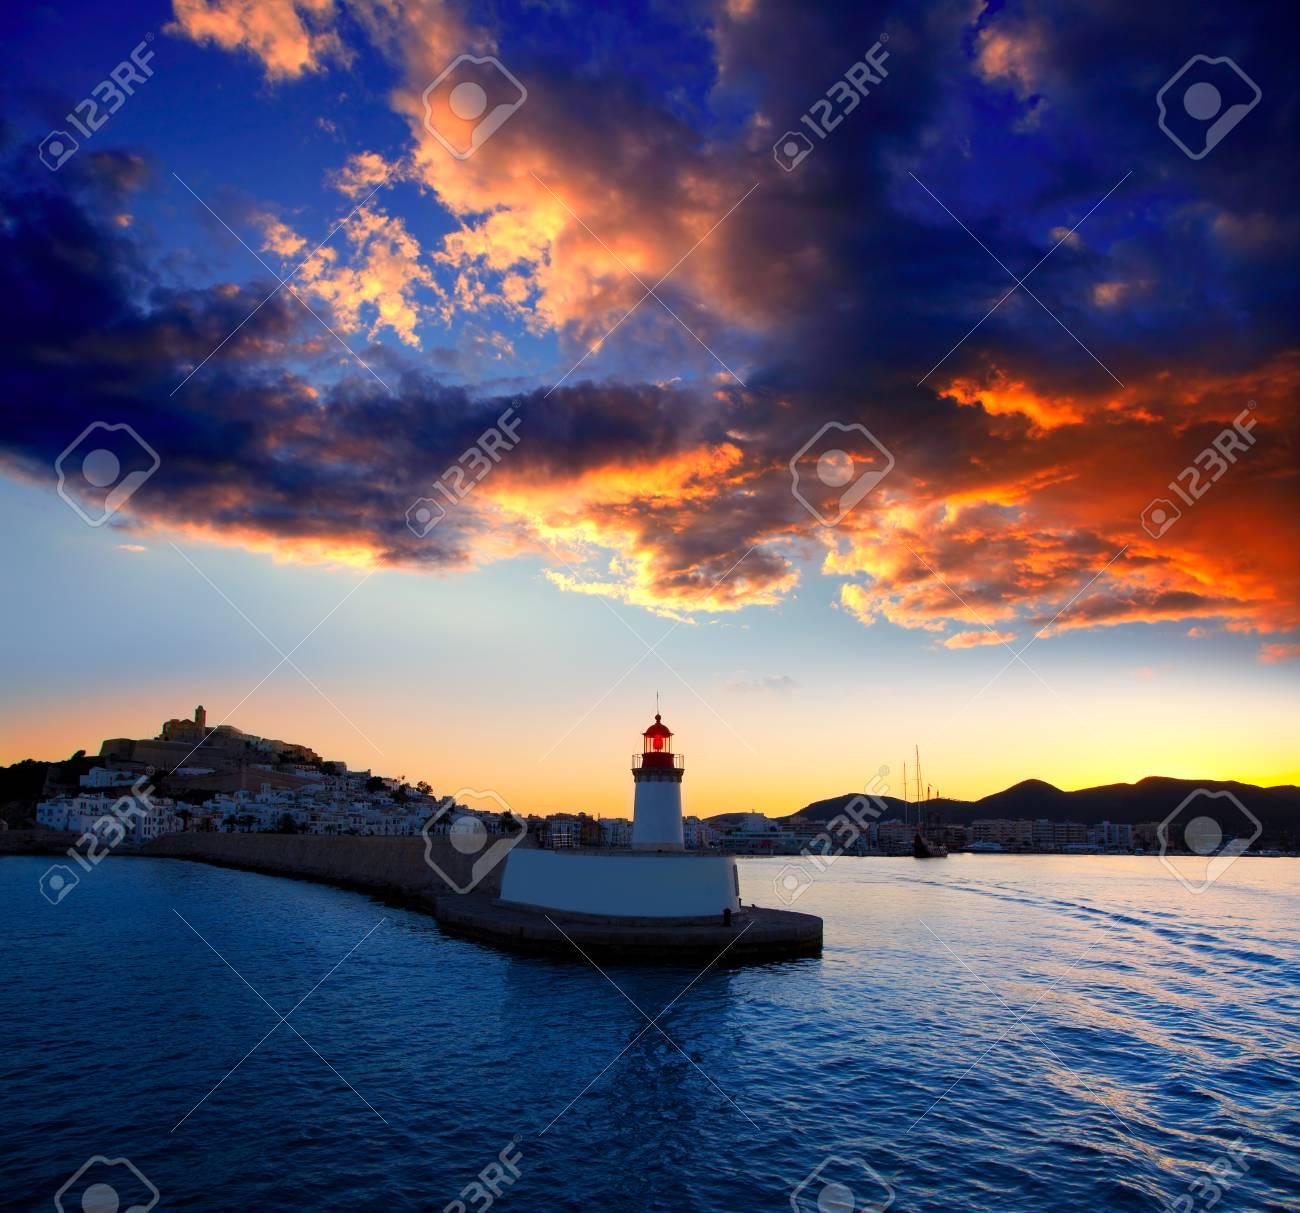 Eibissa Ibiza town sunset from red lighthouse beacon in port Stock Photo - 14266236